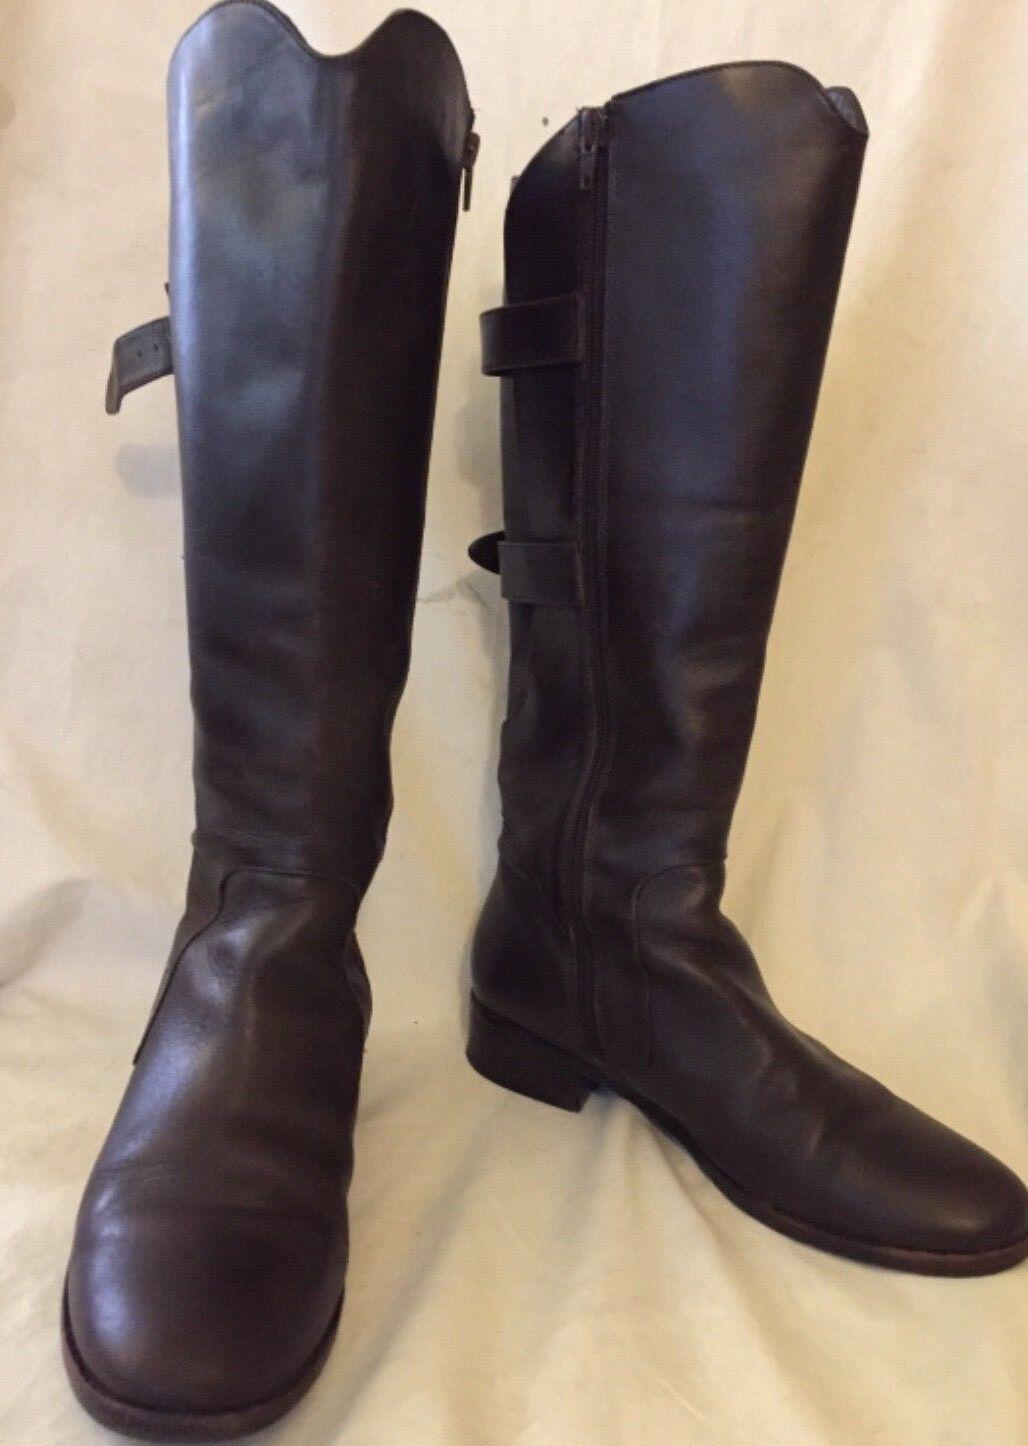 SANZIA Women's boots BROWN size 7.5